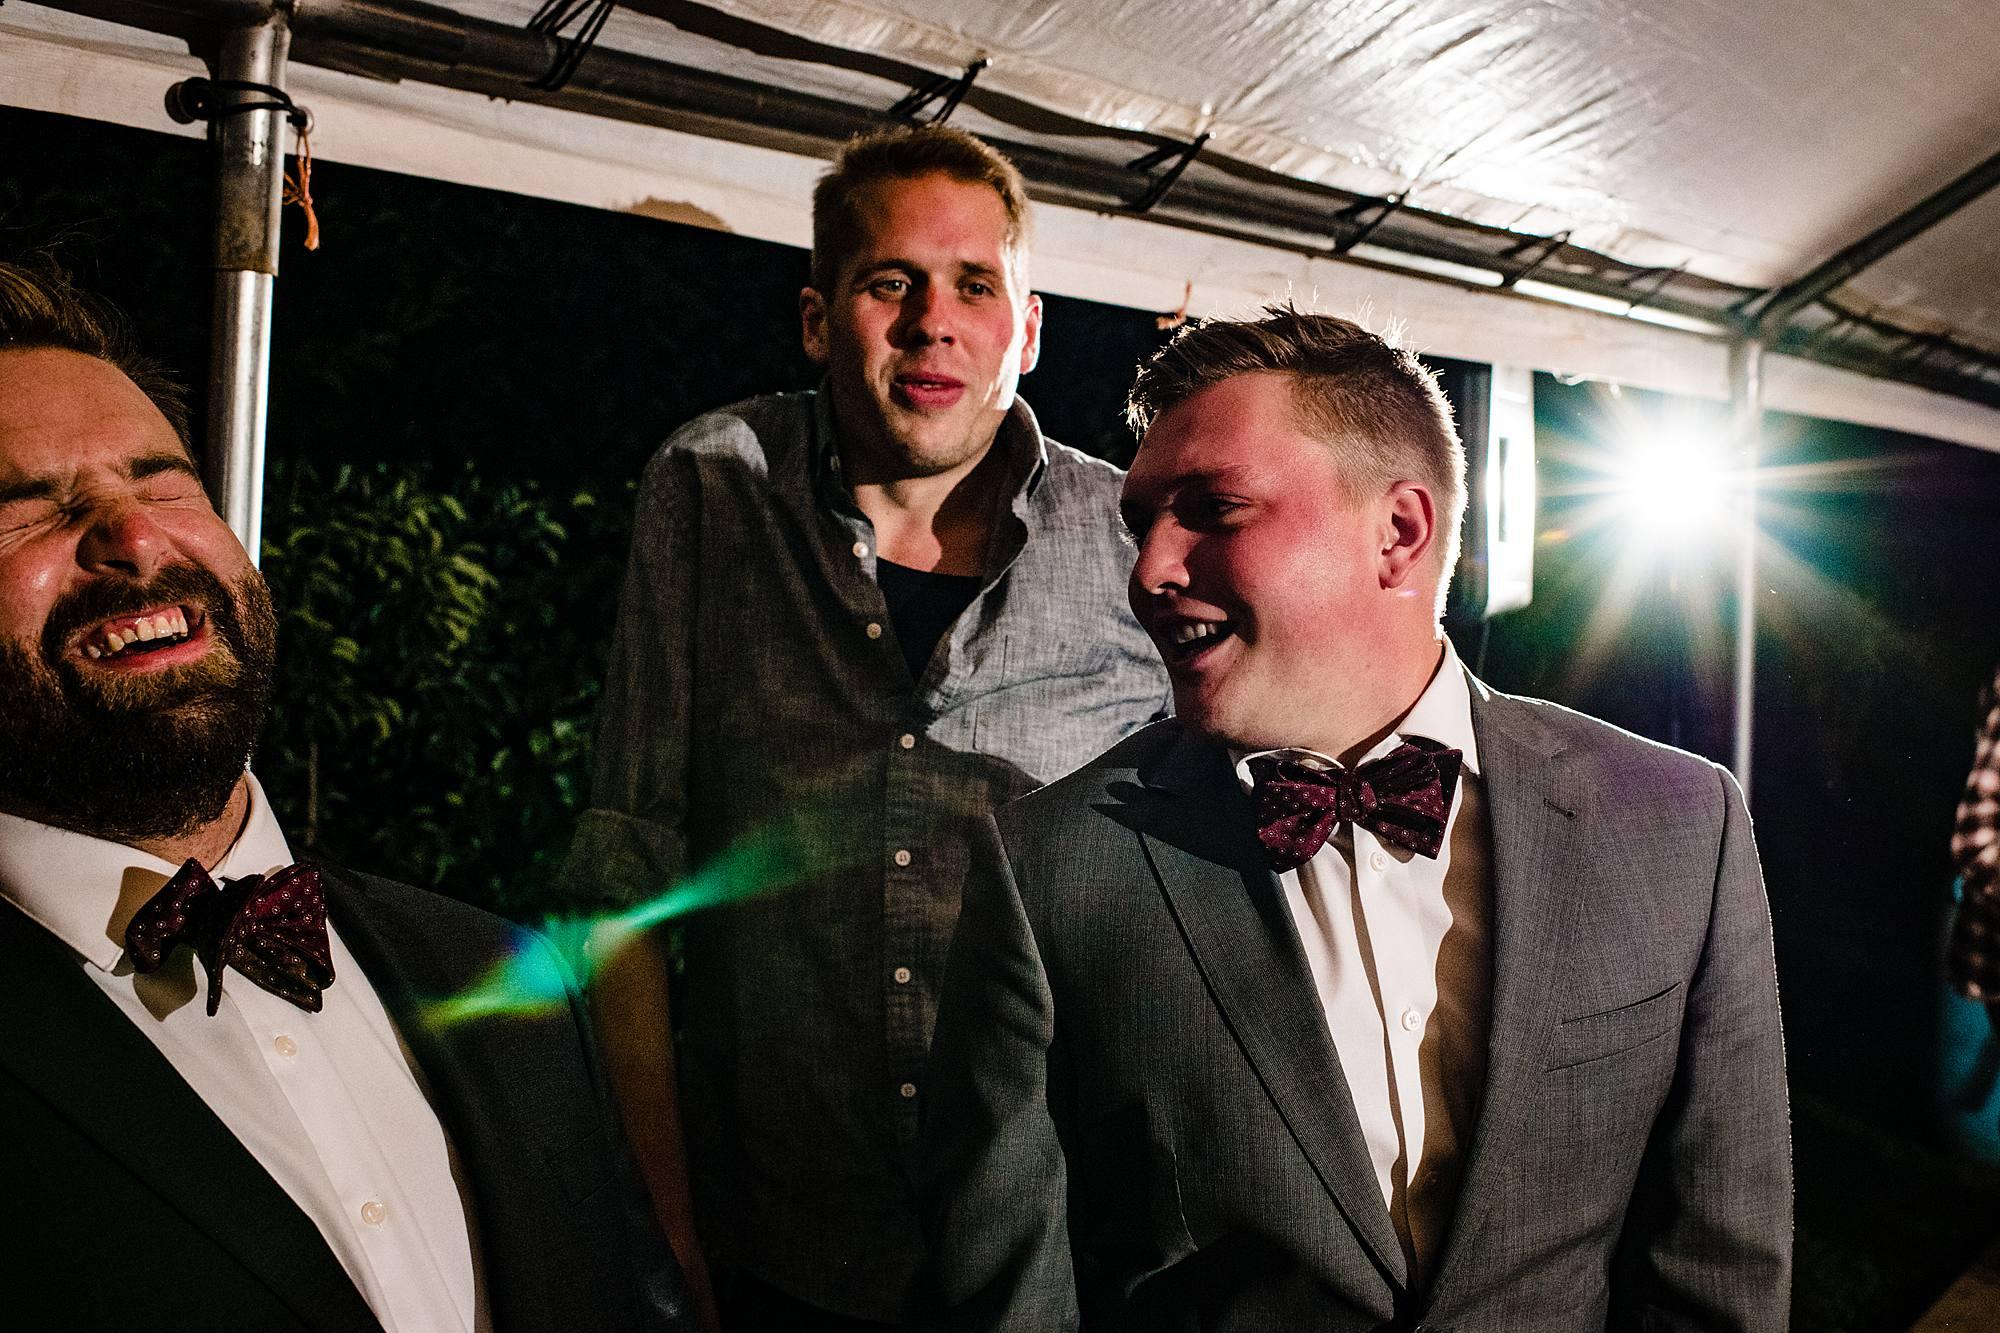 groomsment laugh at wedding reception at lemon creek winery